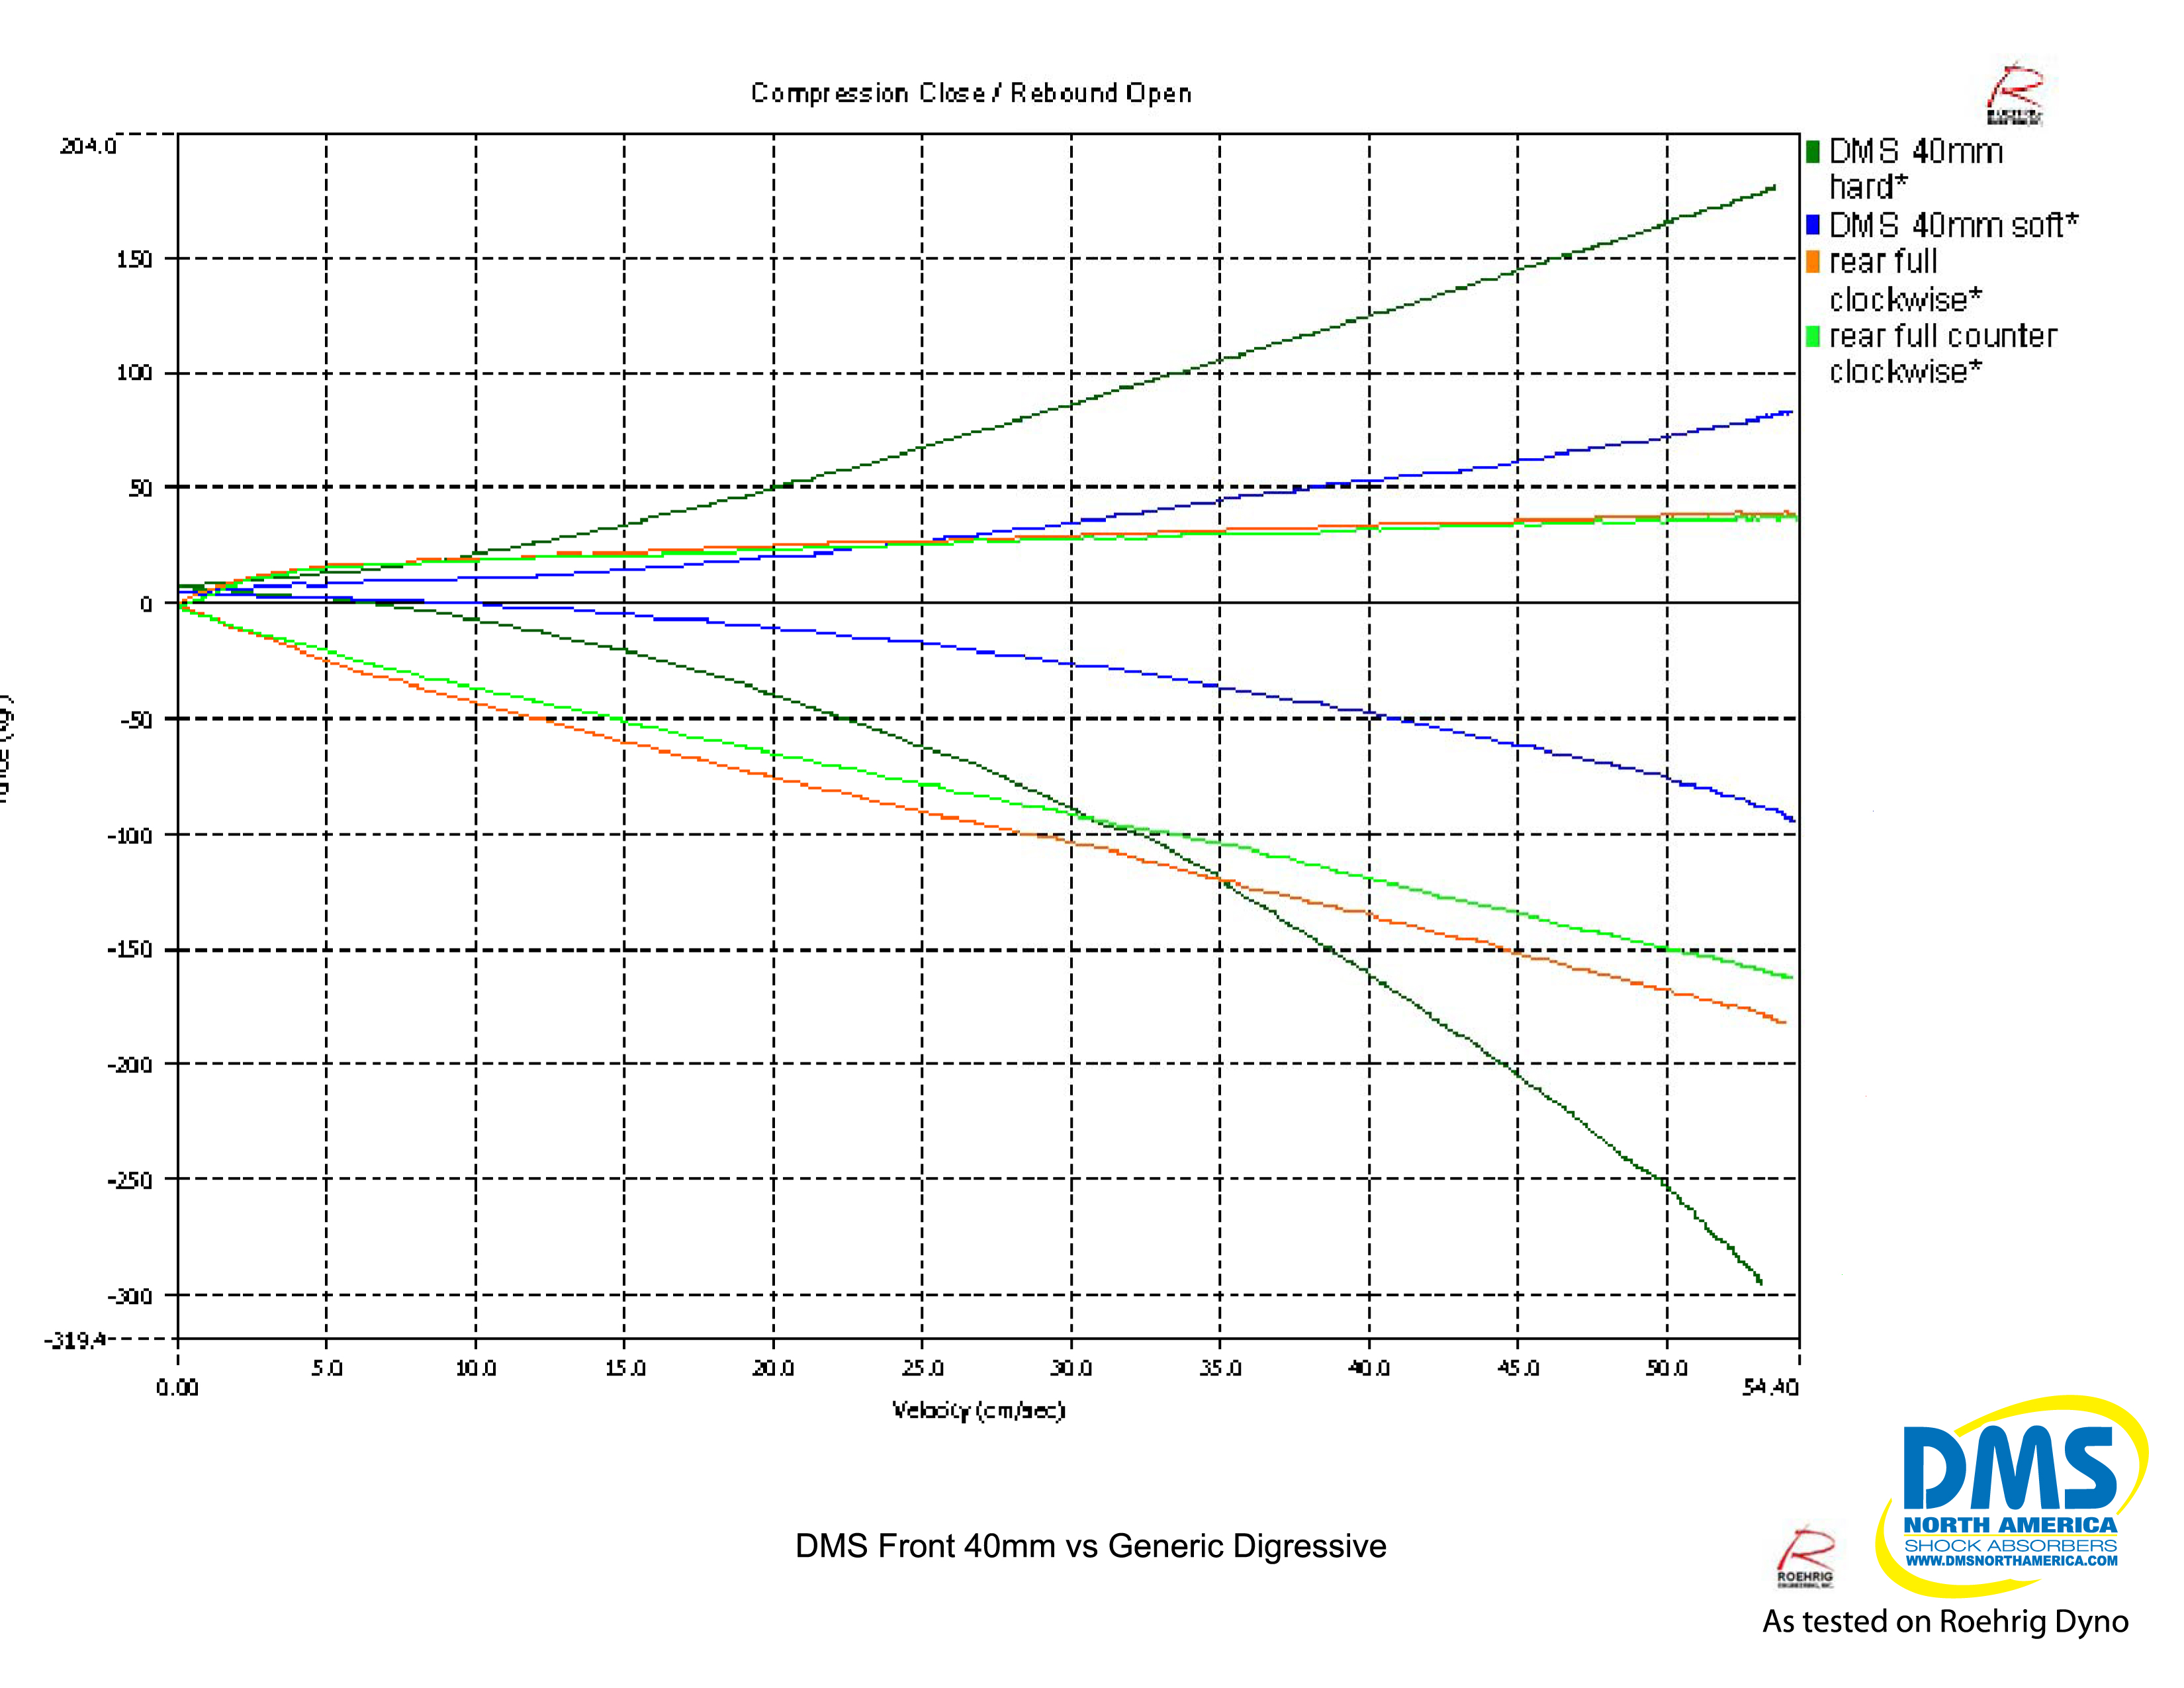 DMS 40mm Subaru coilover vs OEM Subaru STI Strut by FLI or Fine Line Imports